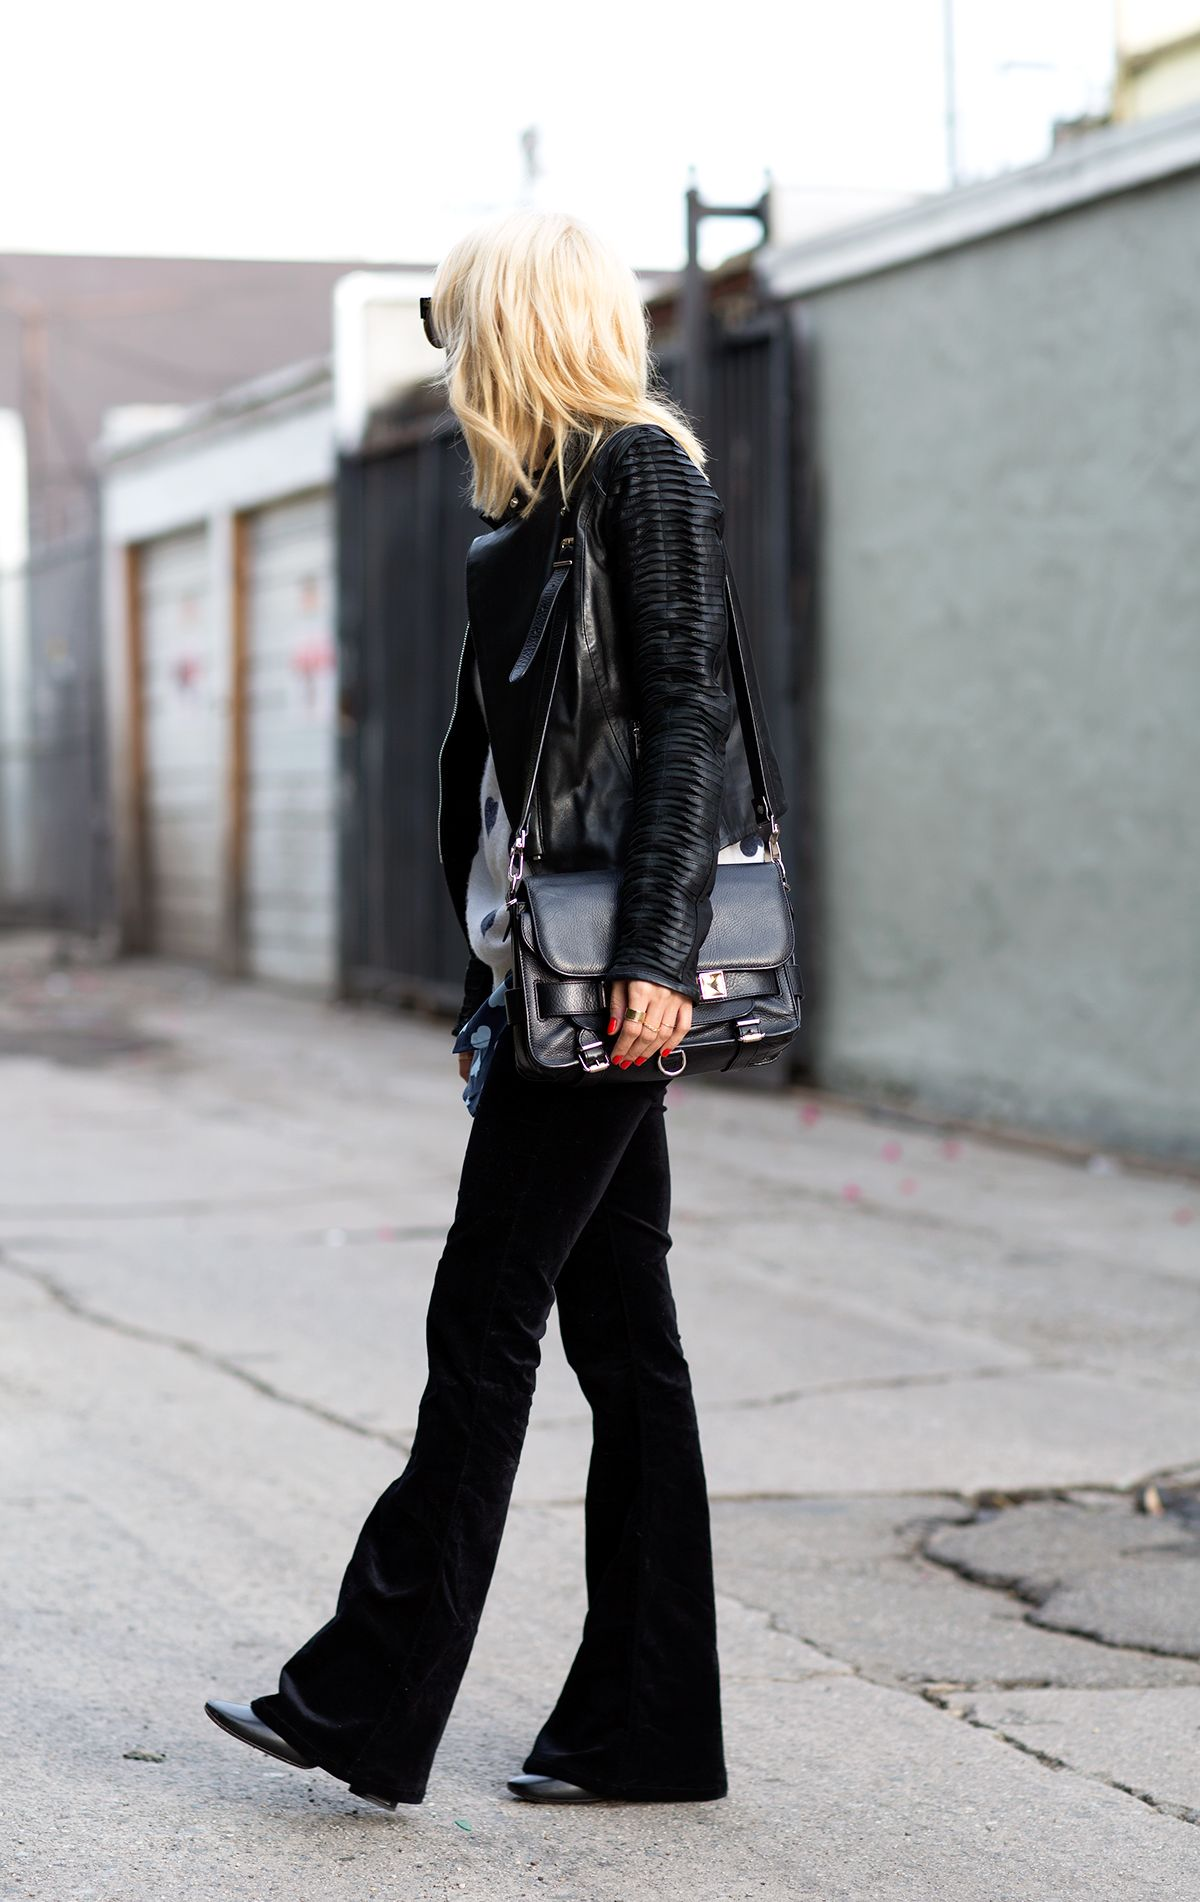 ALWAYSJUDGING / XXXL LAYERS //  #Fashion, #FashionBlog, #FashionBlogger, #Ootd, #OutfitOfTheDay, #Style